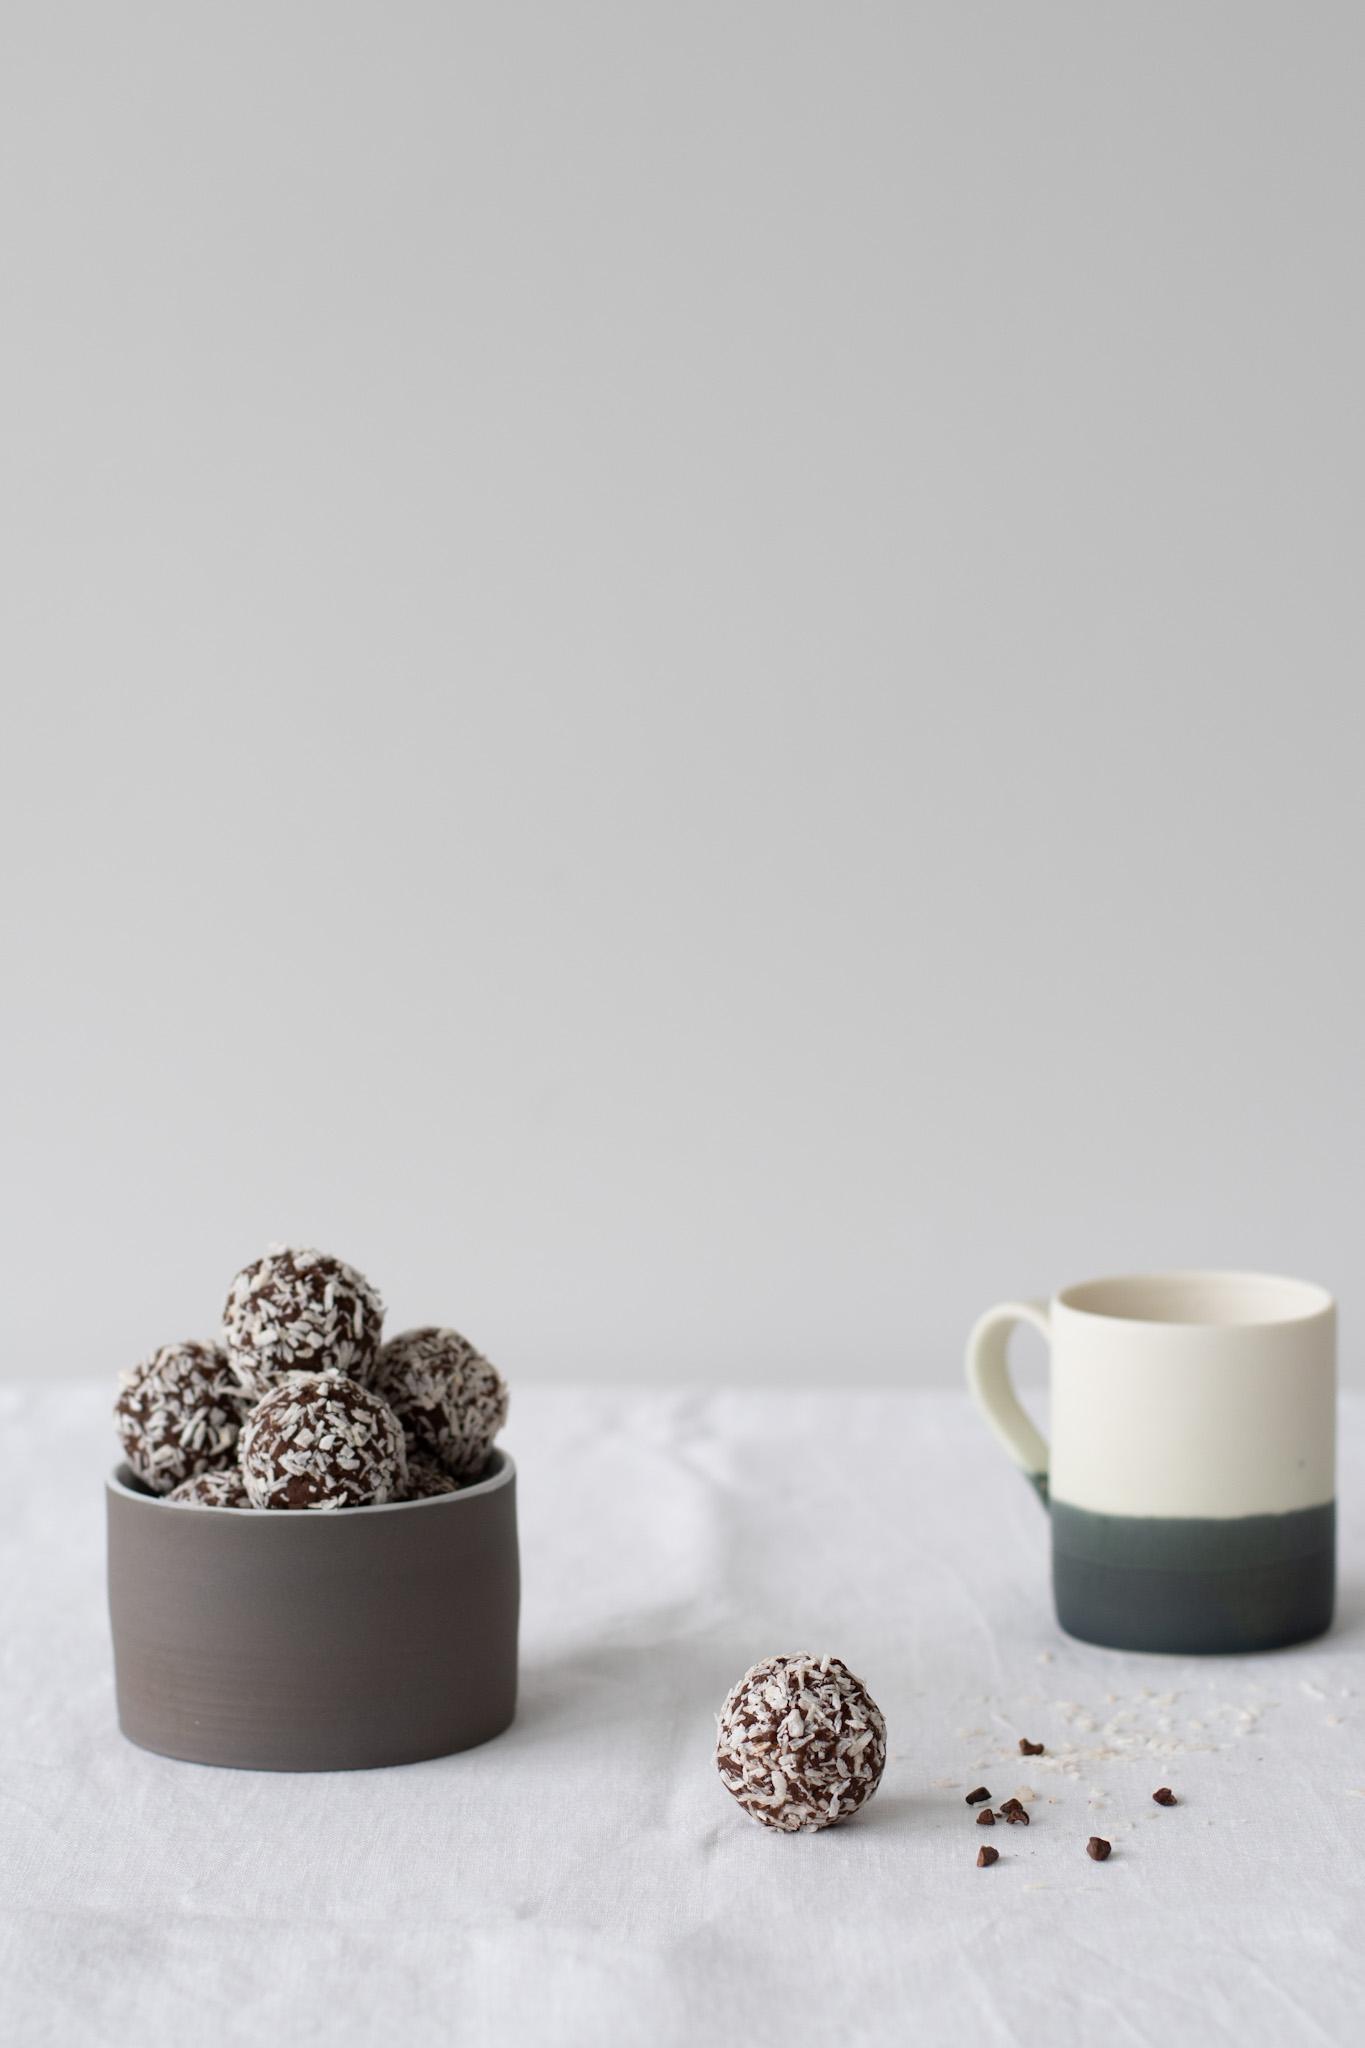 Healthy Swedish Chocolate Balls (Chokladbollar)